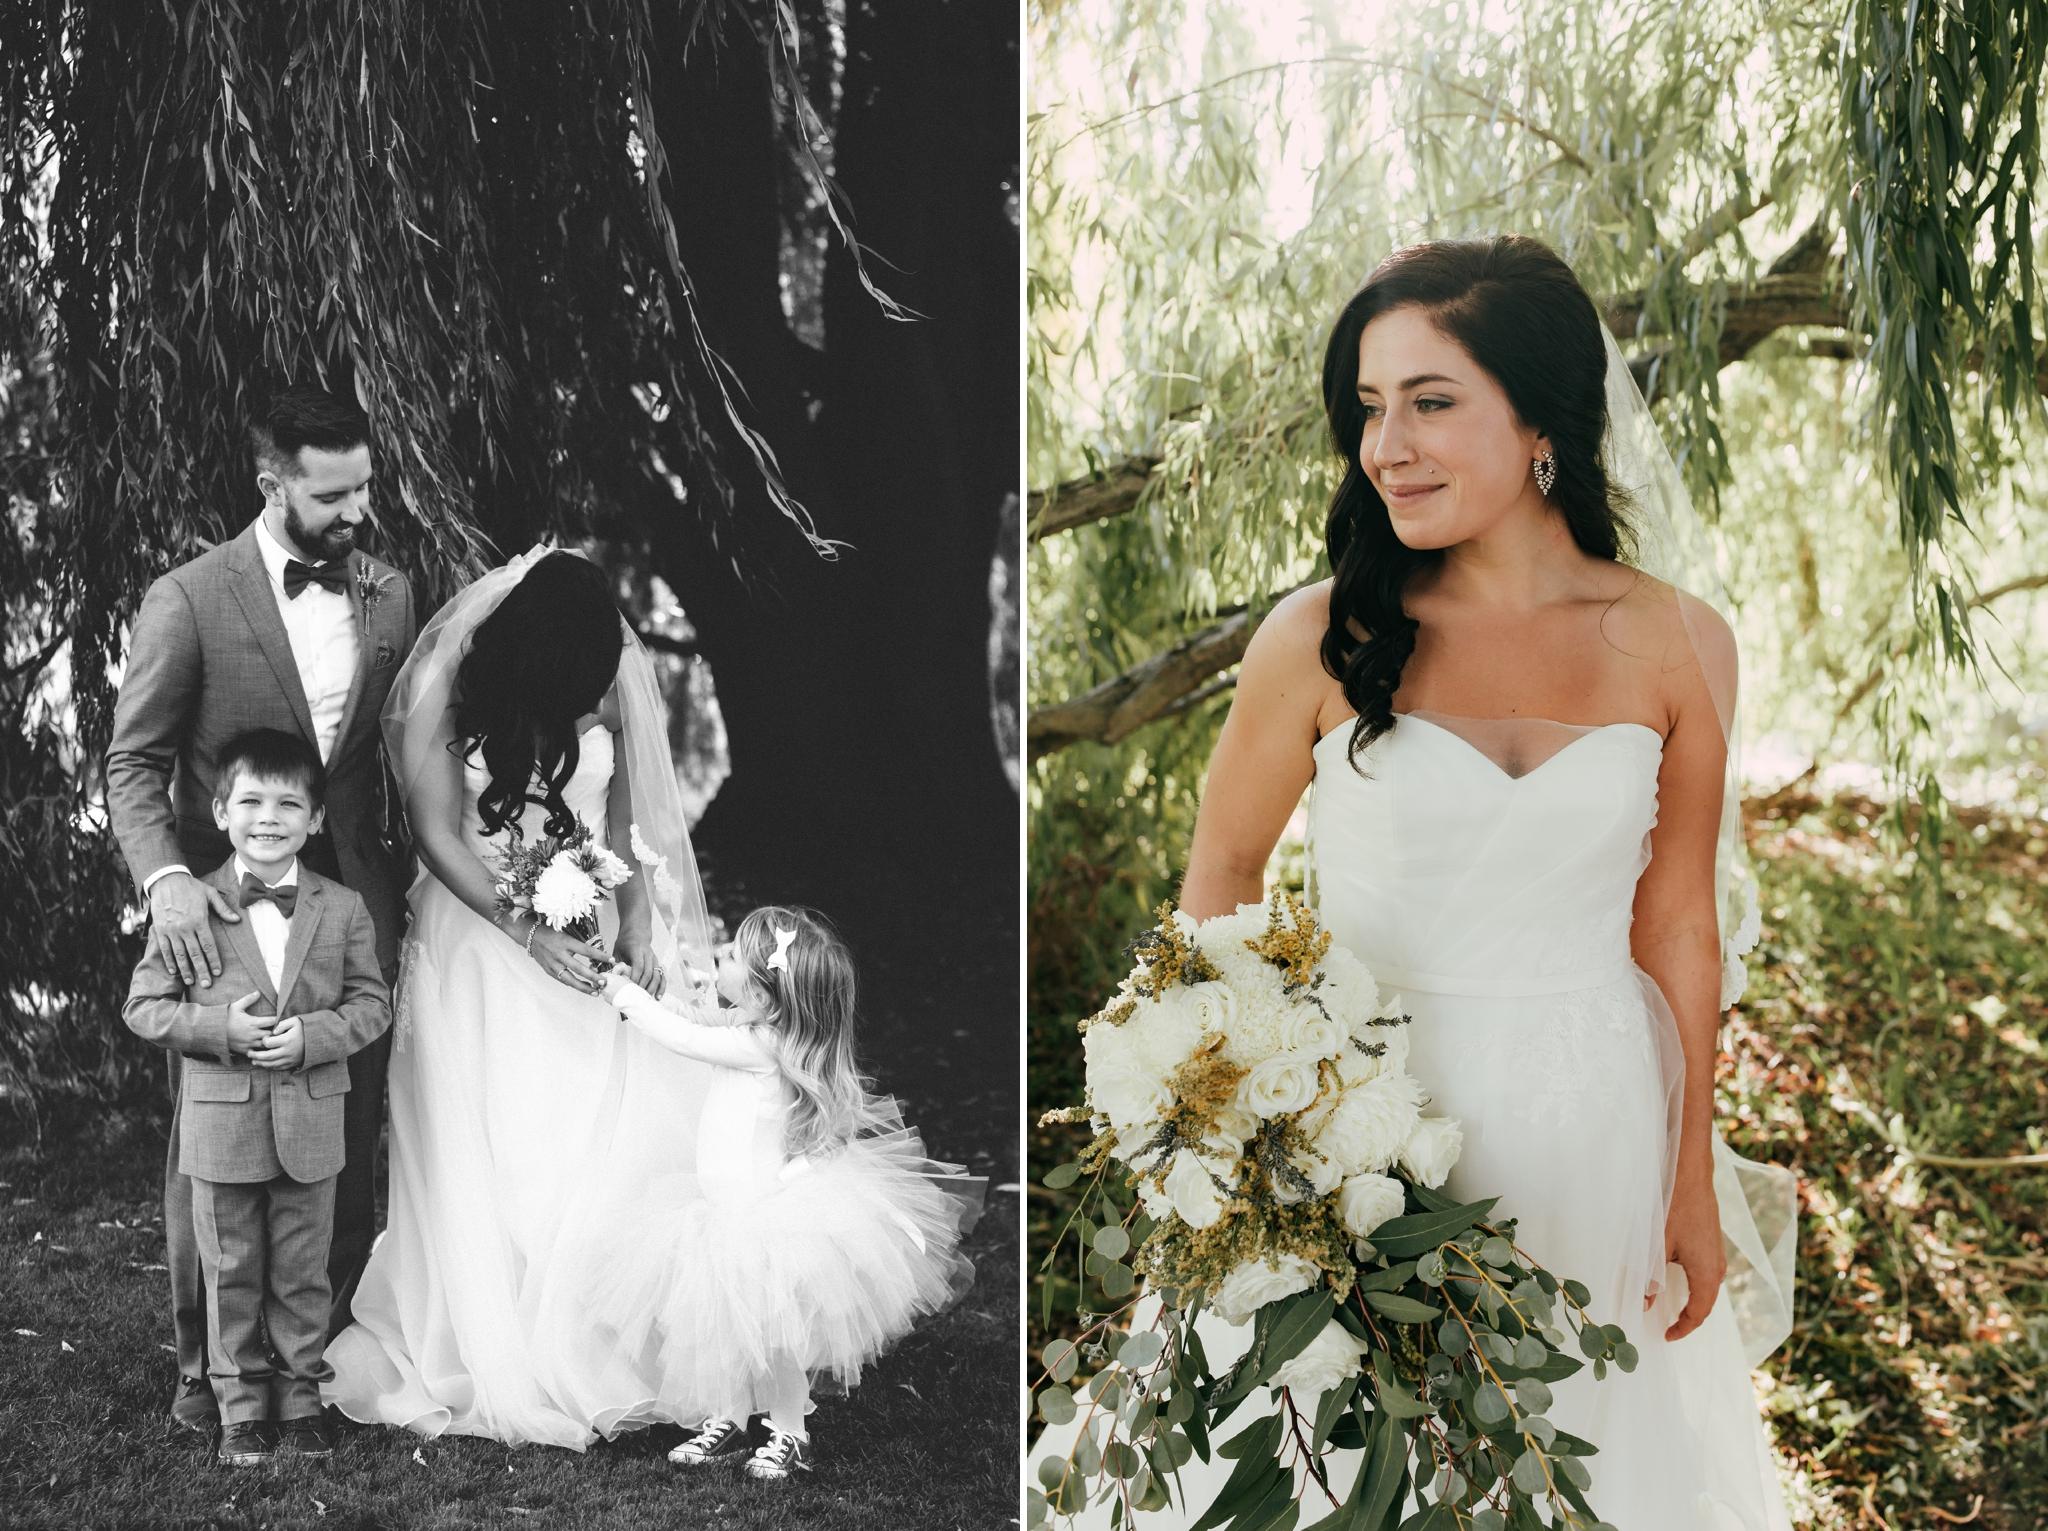 Heather-Nash-Photography-Aurora-Cellars-Wedding-Leelanau-Peninsula-Michigan_0142.jpg